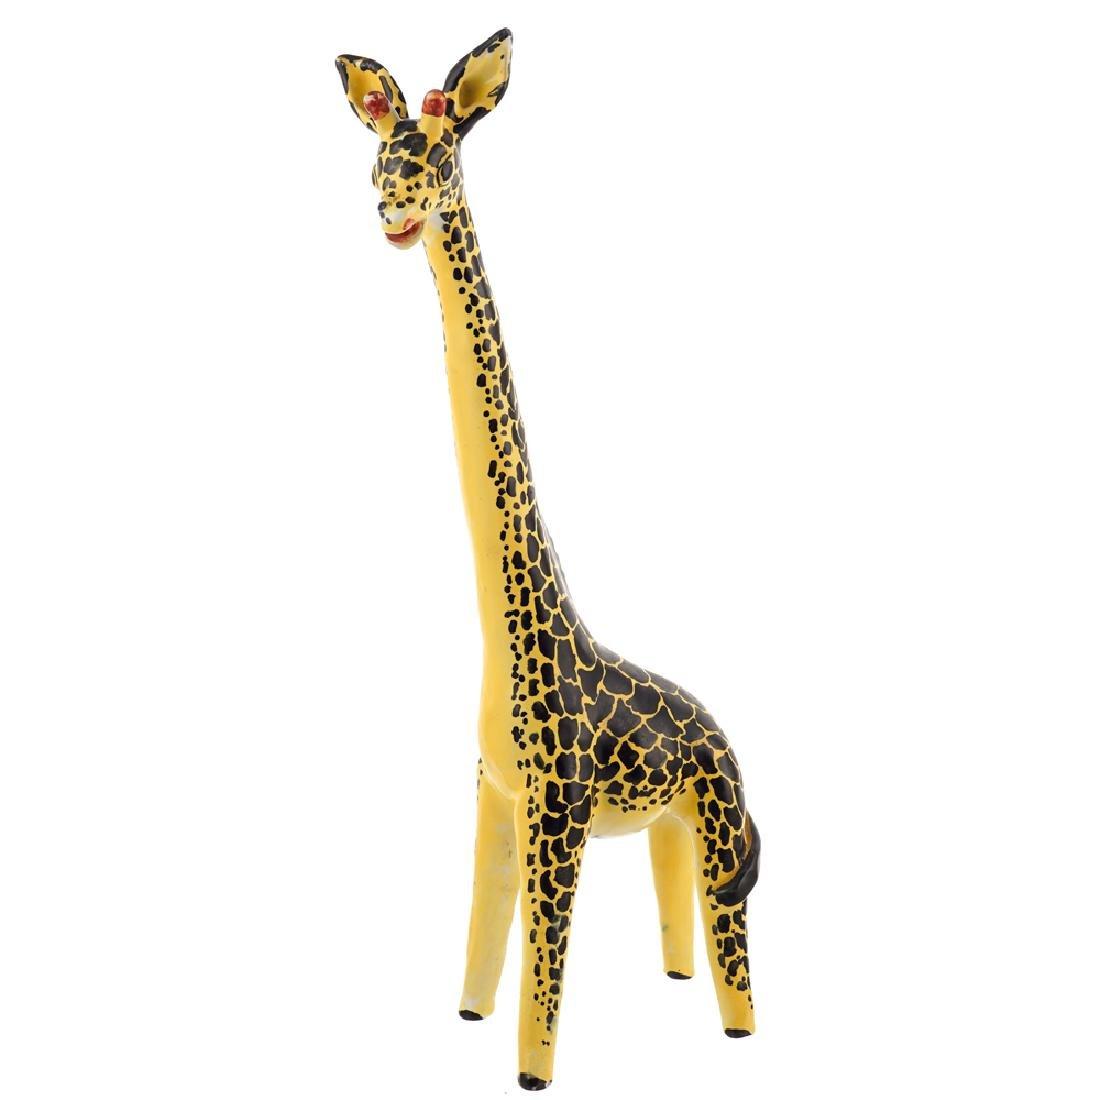 A ceramic giraffe scuplture Cava dei Tirreni 20th